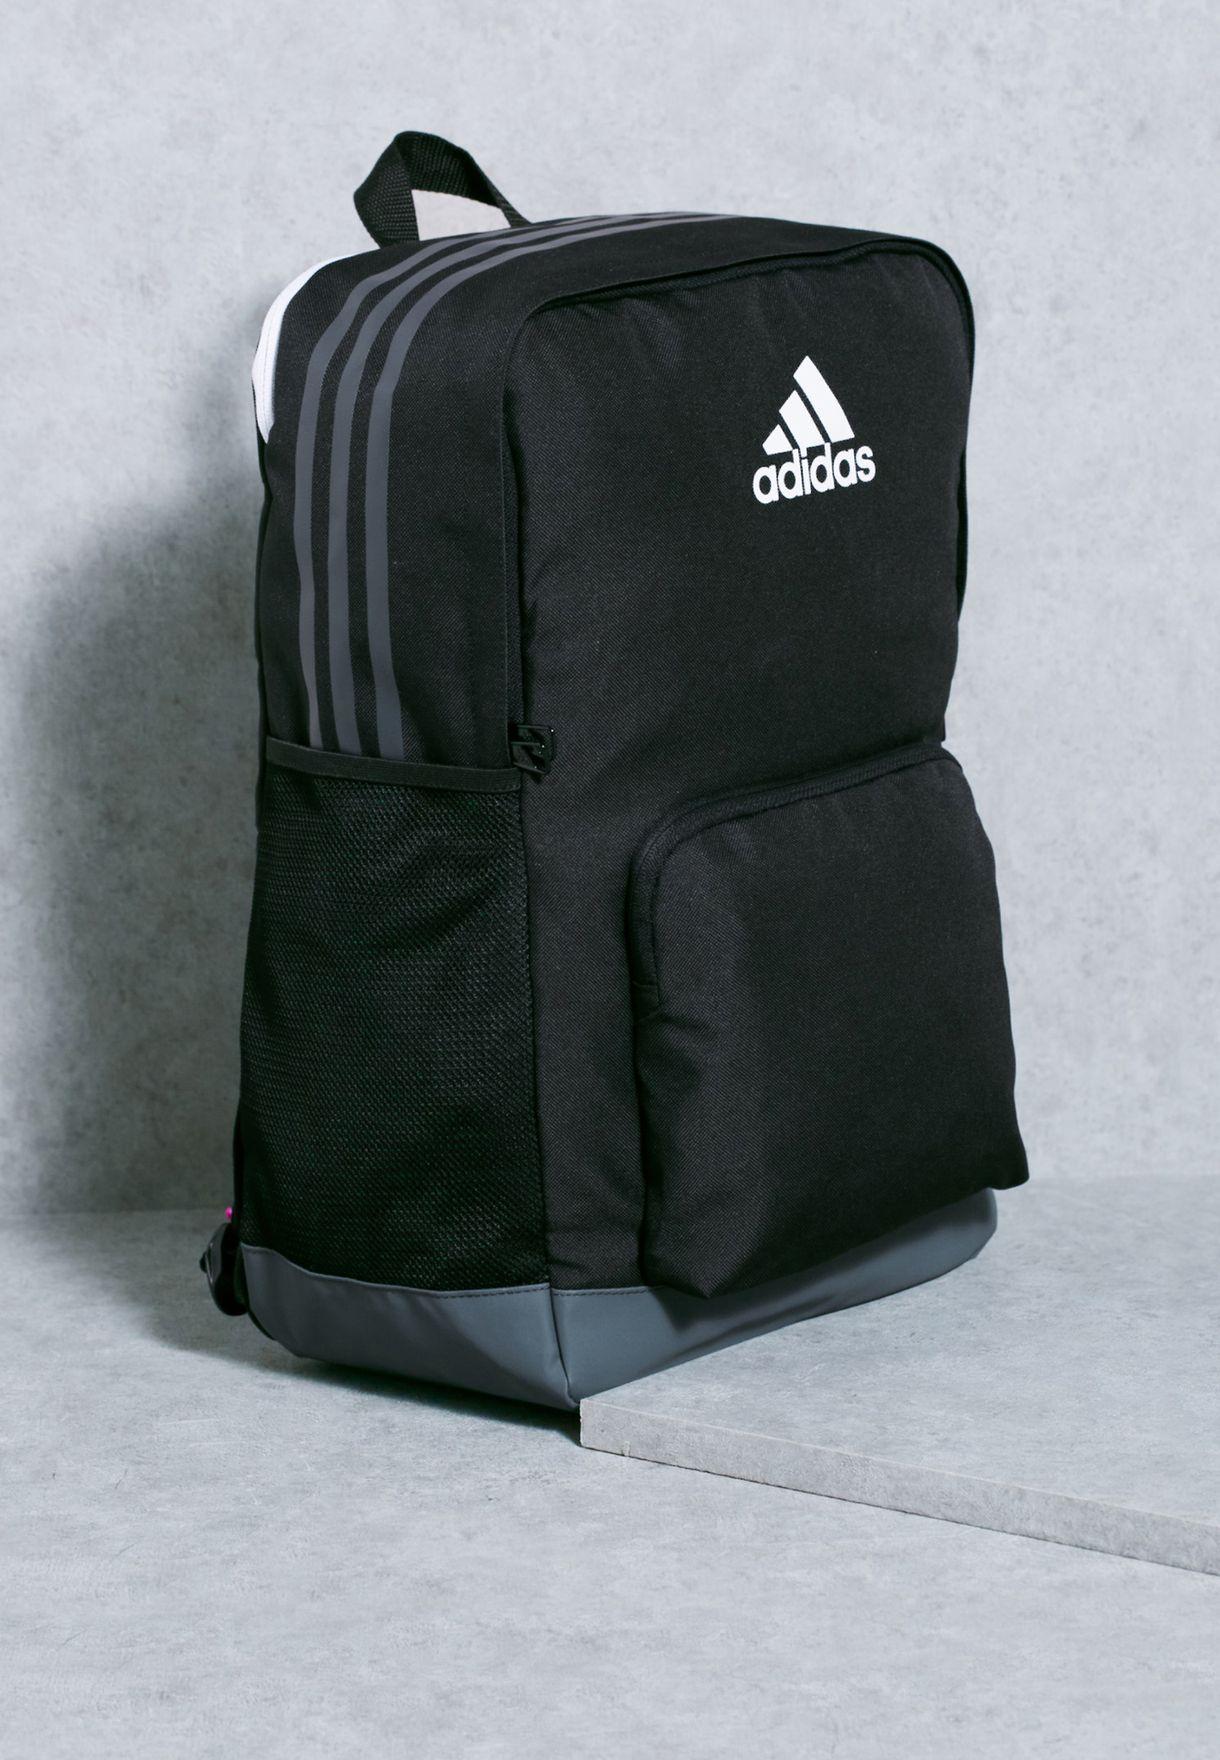 0ffdad5b0f Shop adidas black Tiro Backpack S98393 for Men in Saudi - AD476AC79PZS